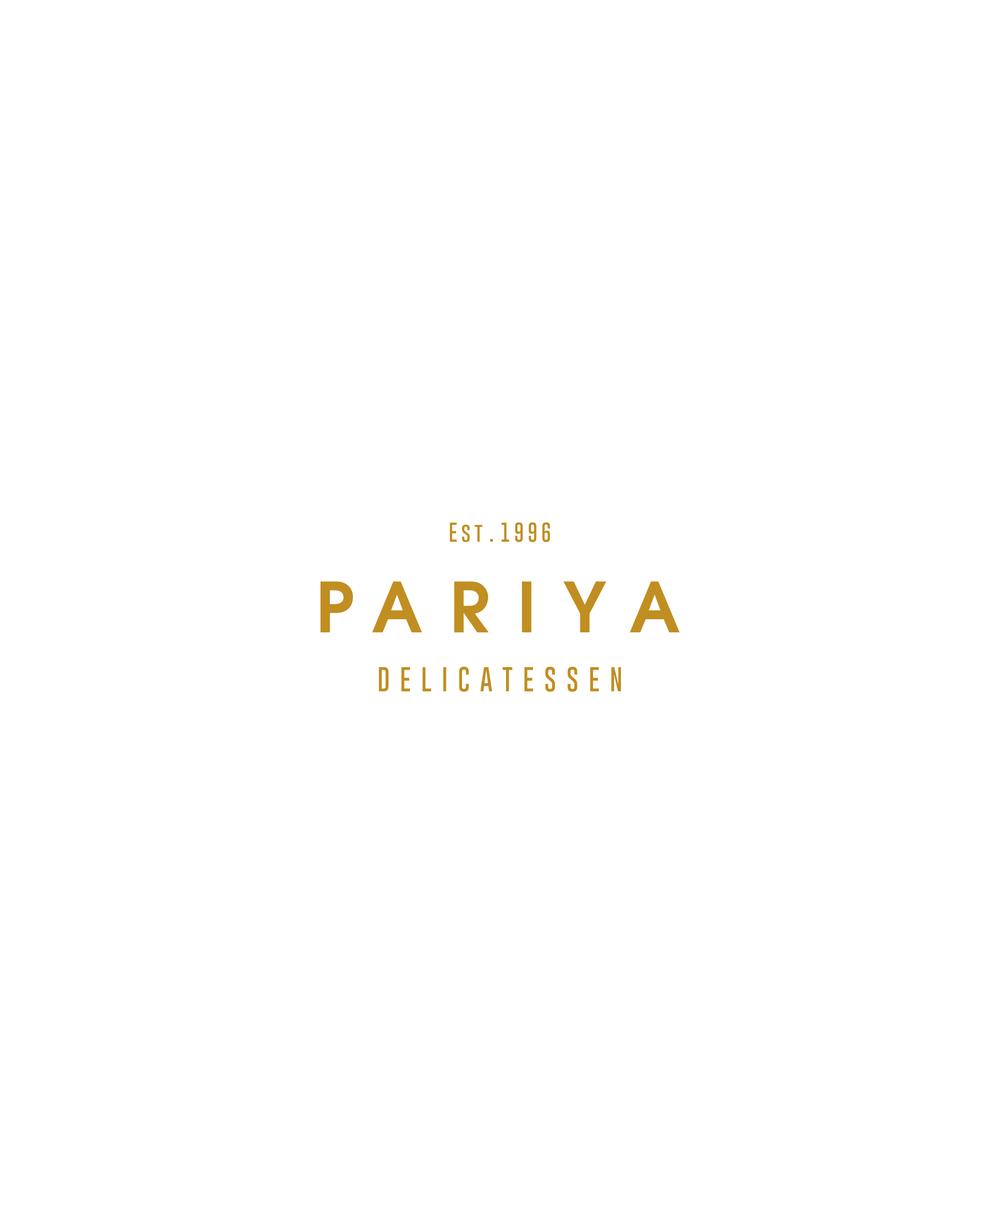 pariya_03.png